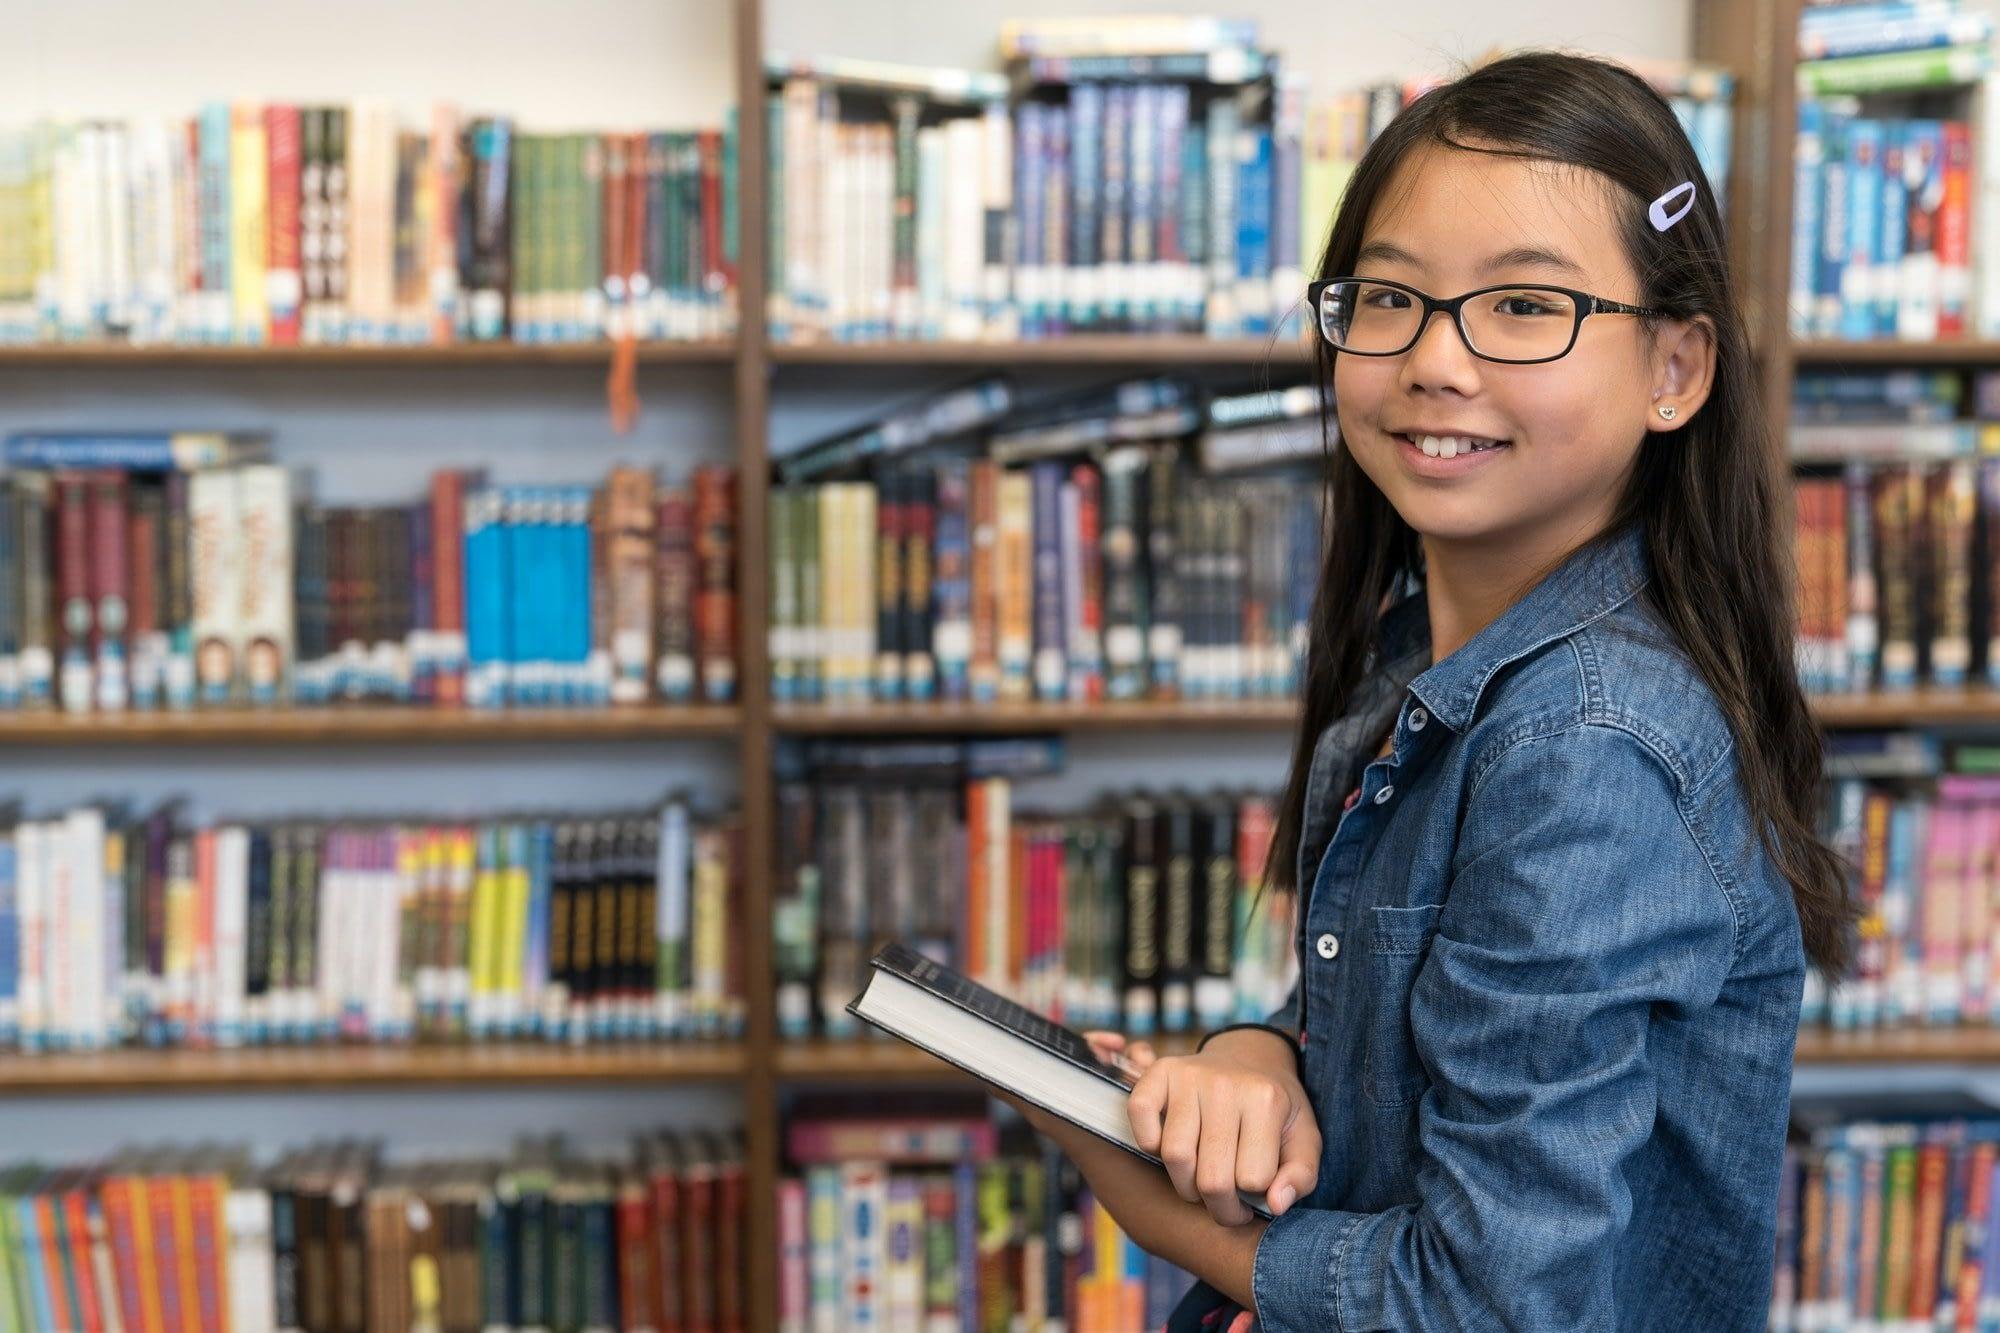 Asian teenage girl with eyeglasses in school library